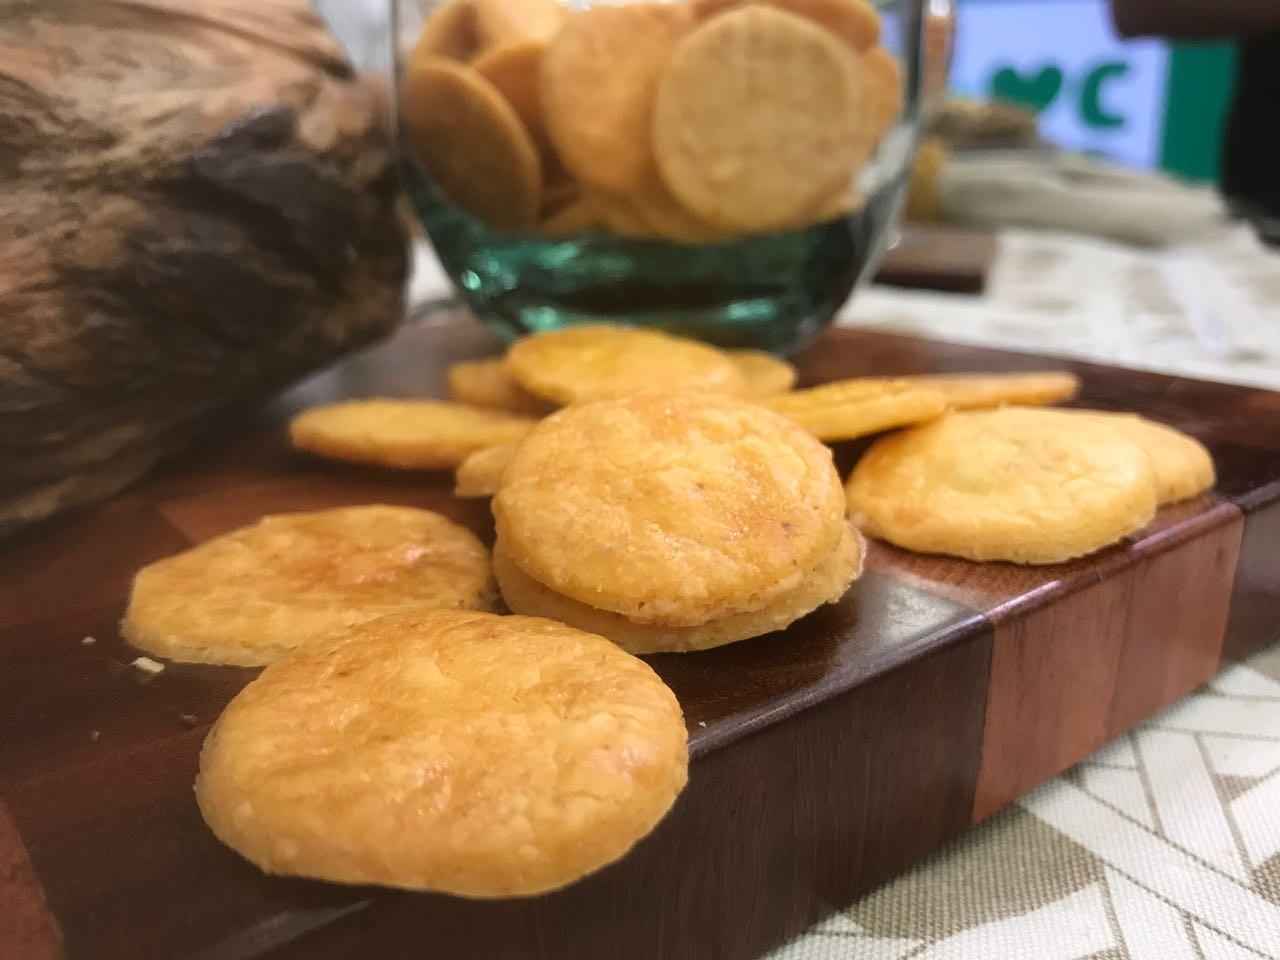 Extremamente Receitas de Biscoitos | Pães e salgados - Receitas Gshow BO19